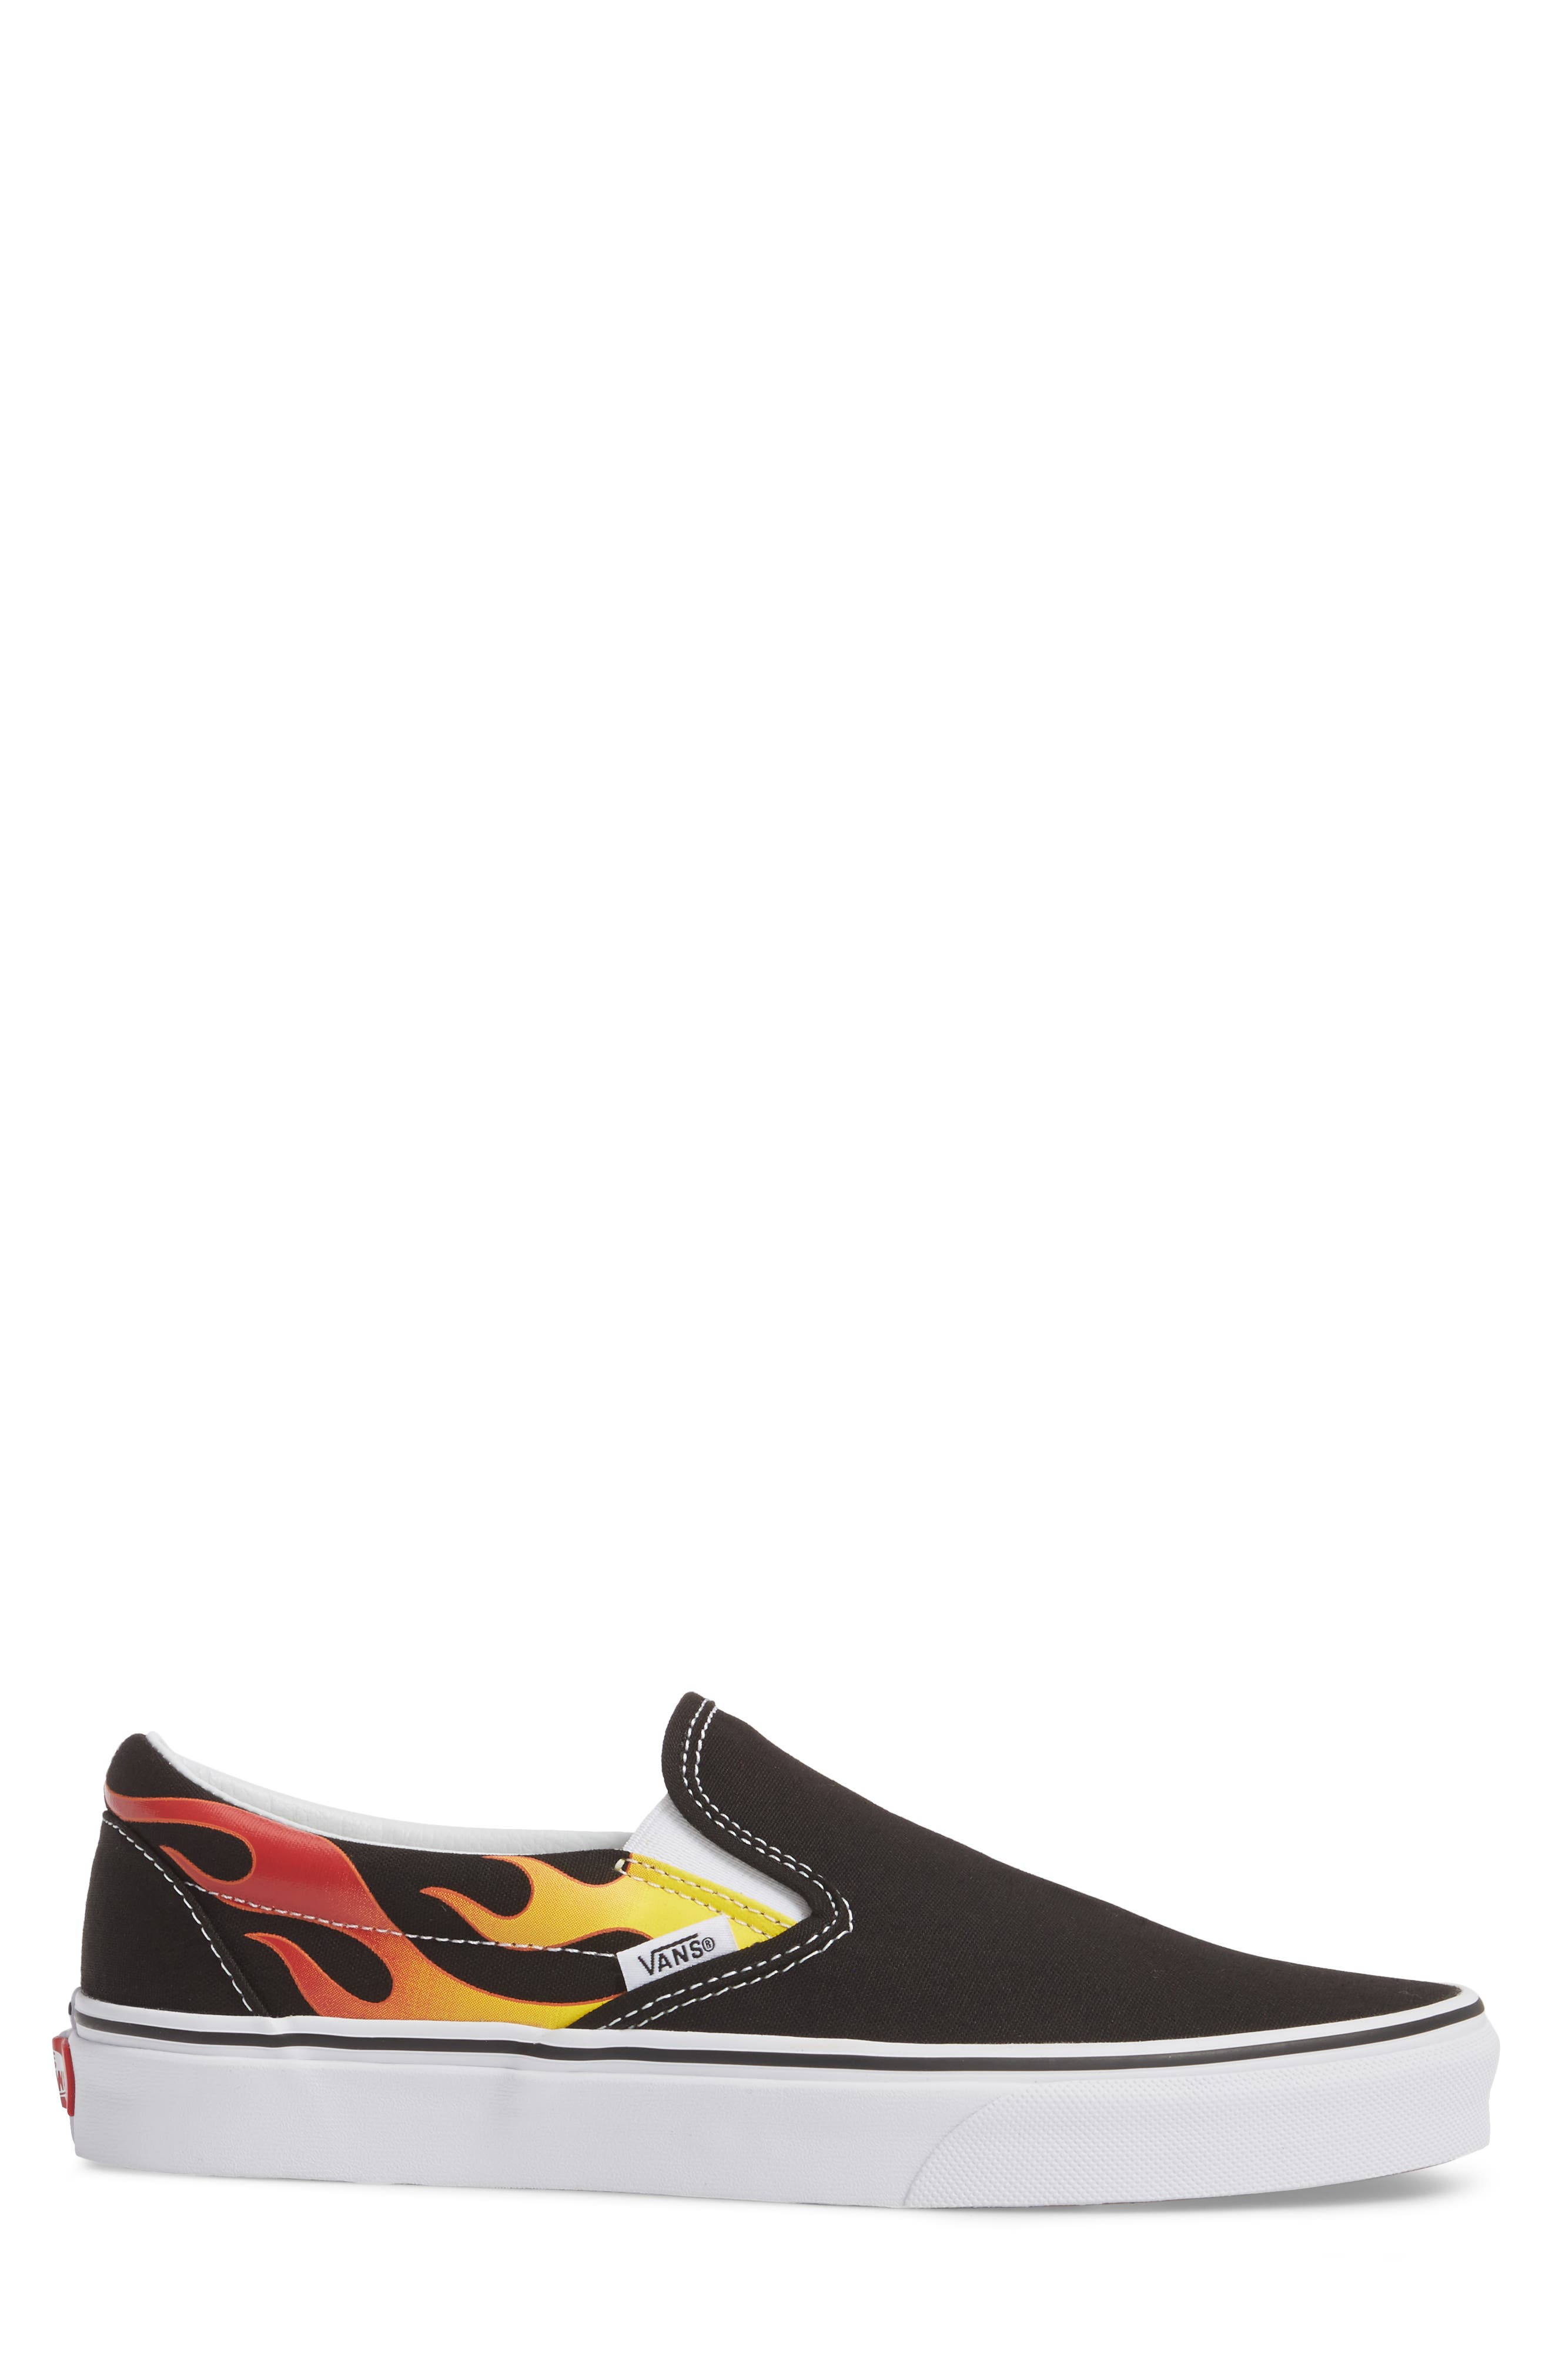 UA Classic Slip-On Sneaker,                             Alternate thumbnail 3, color,                             Black/ Black/ True White